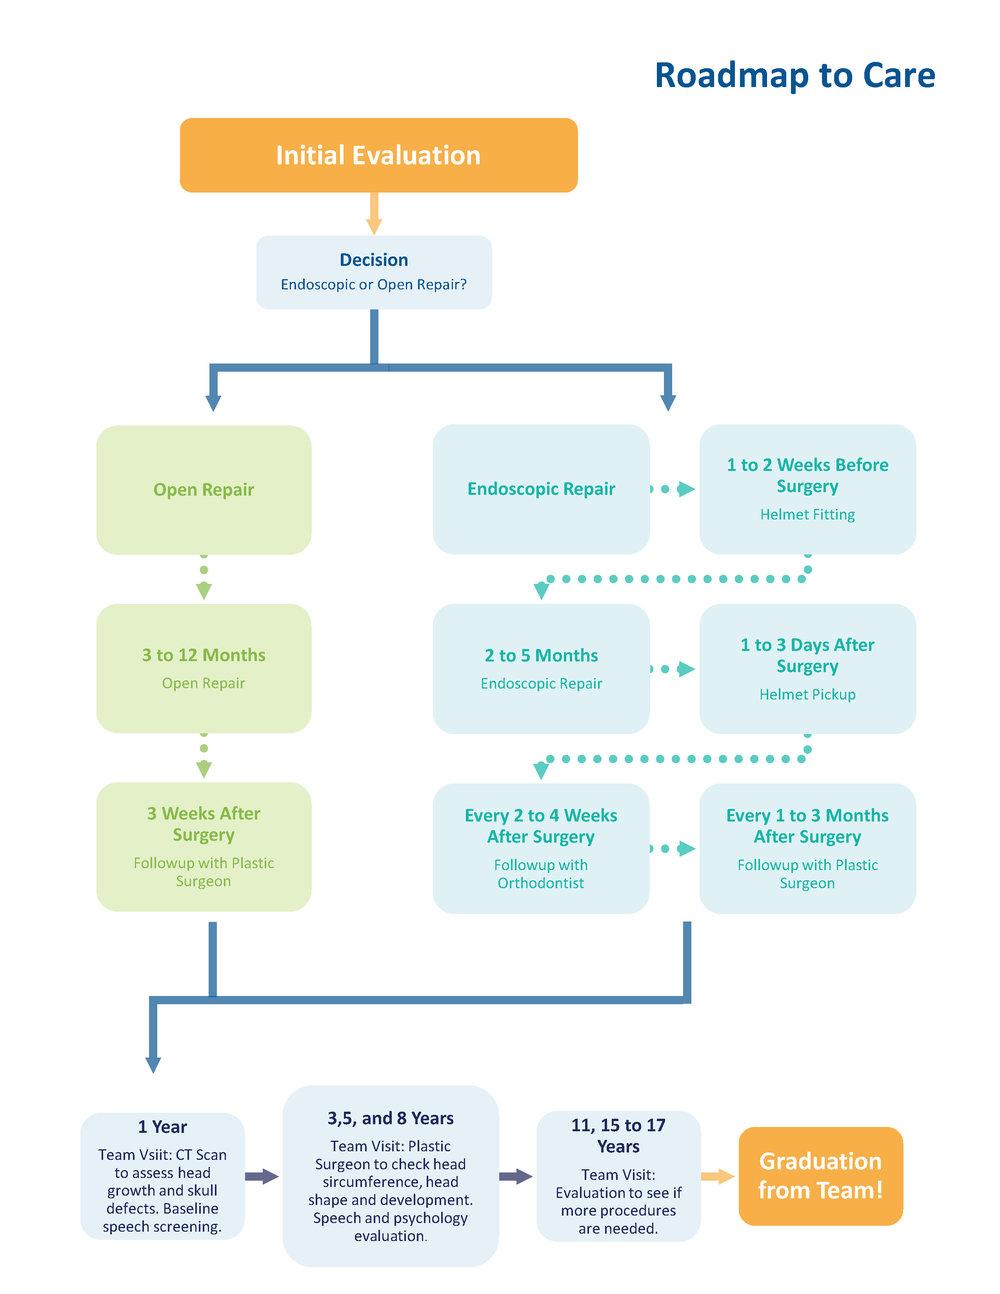 Roadmap to Care.jpg